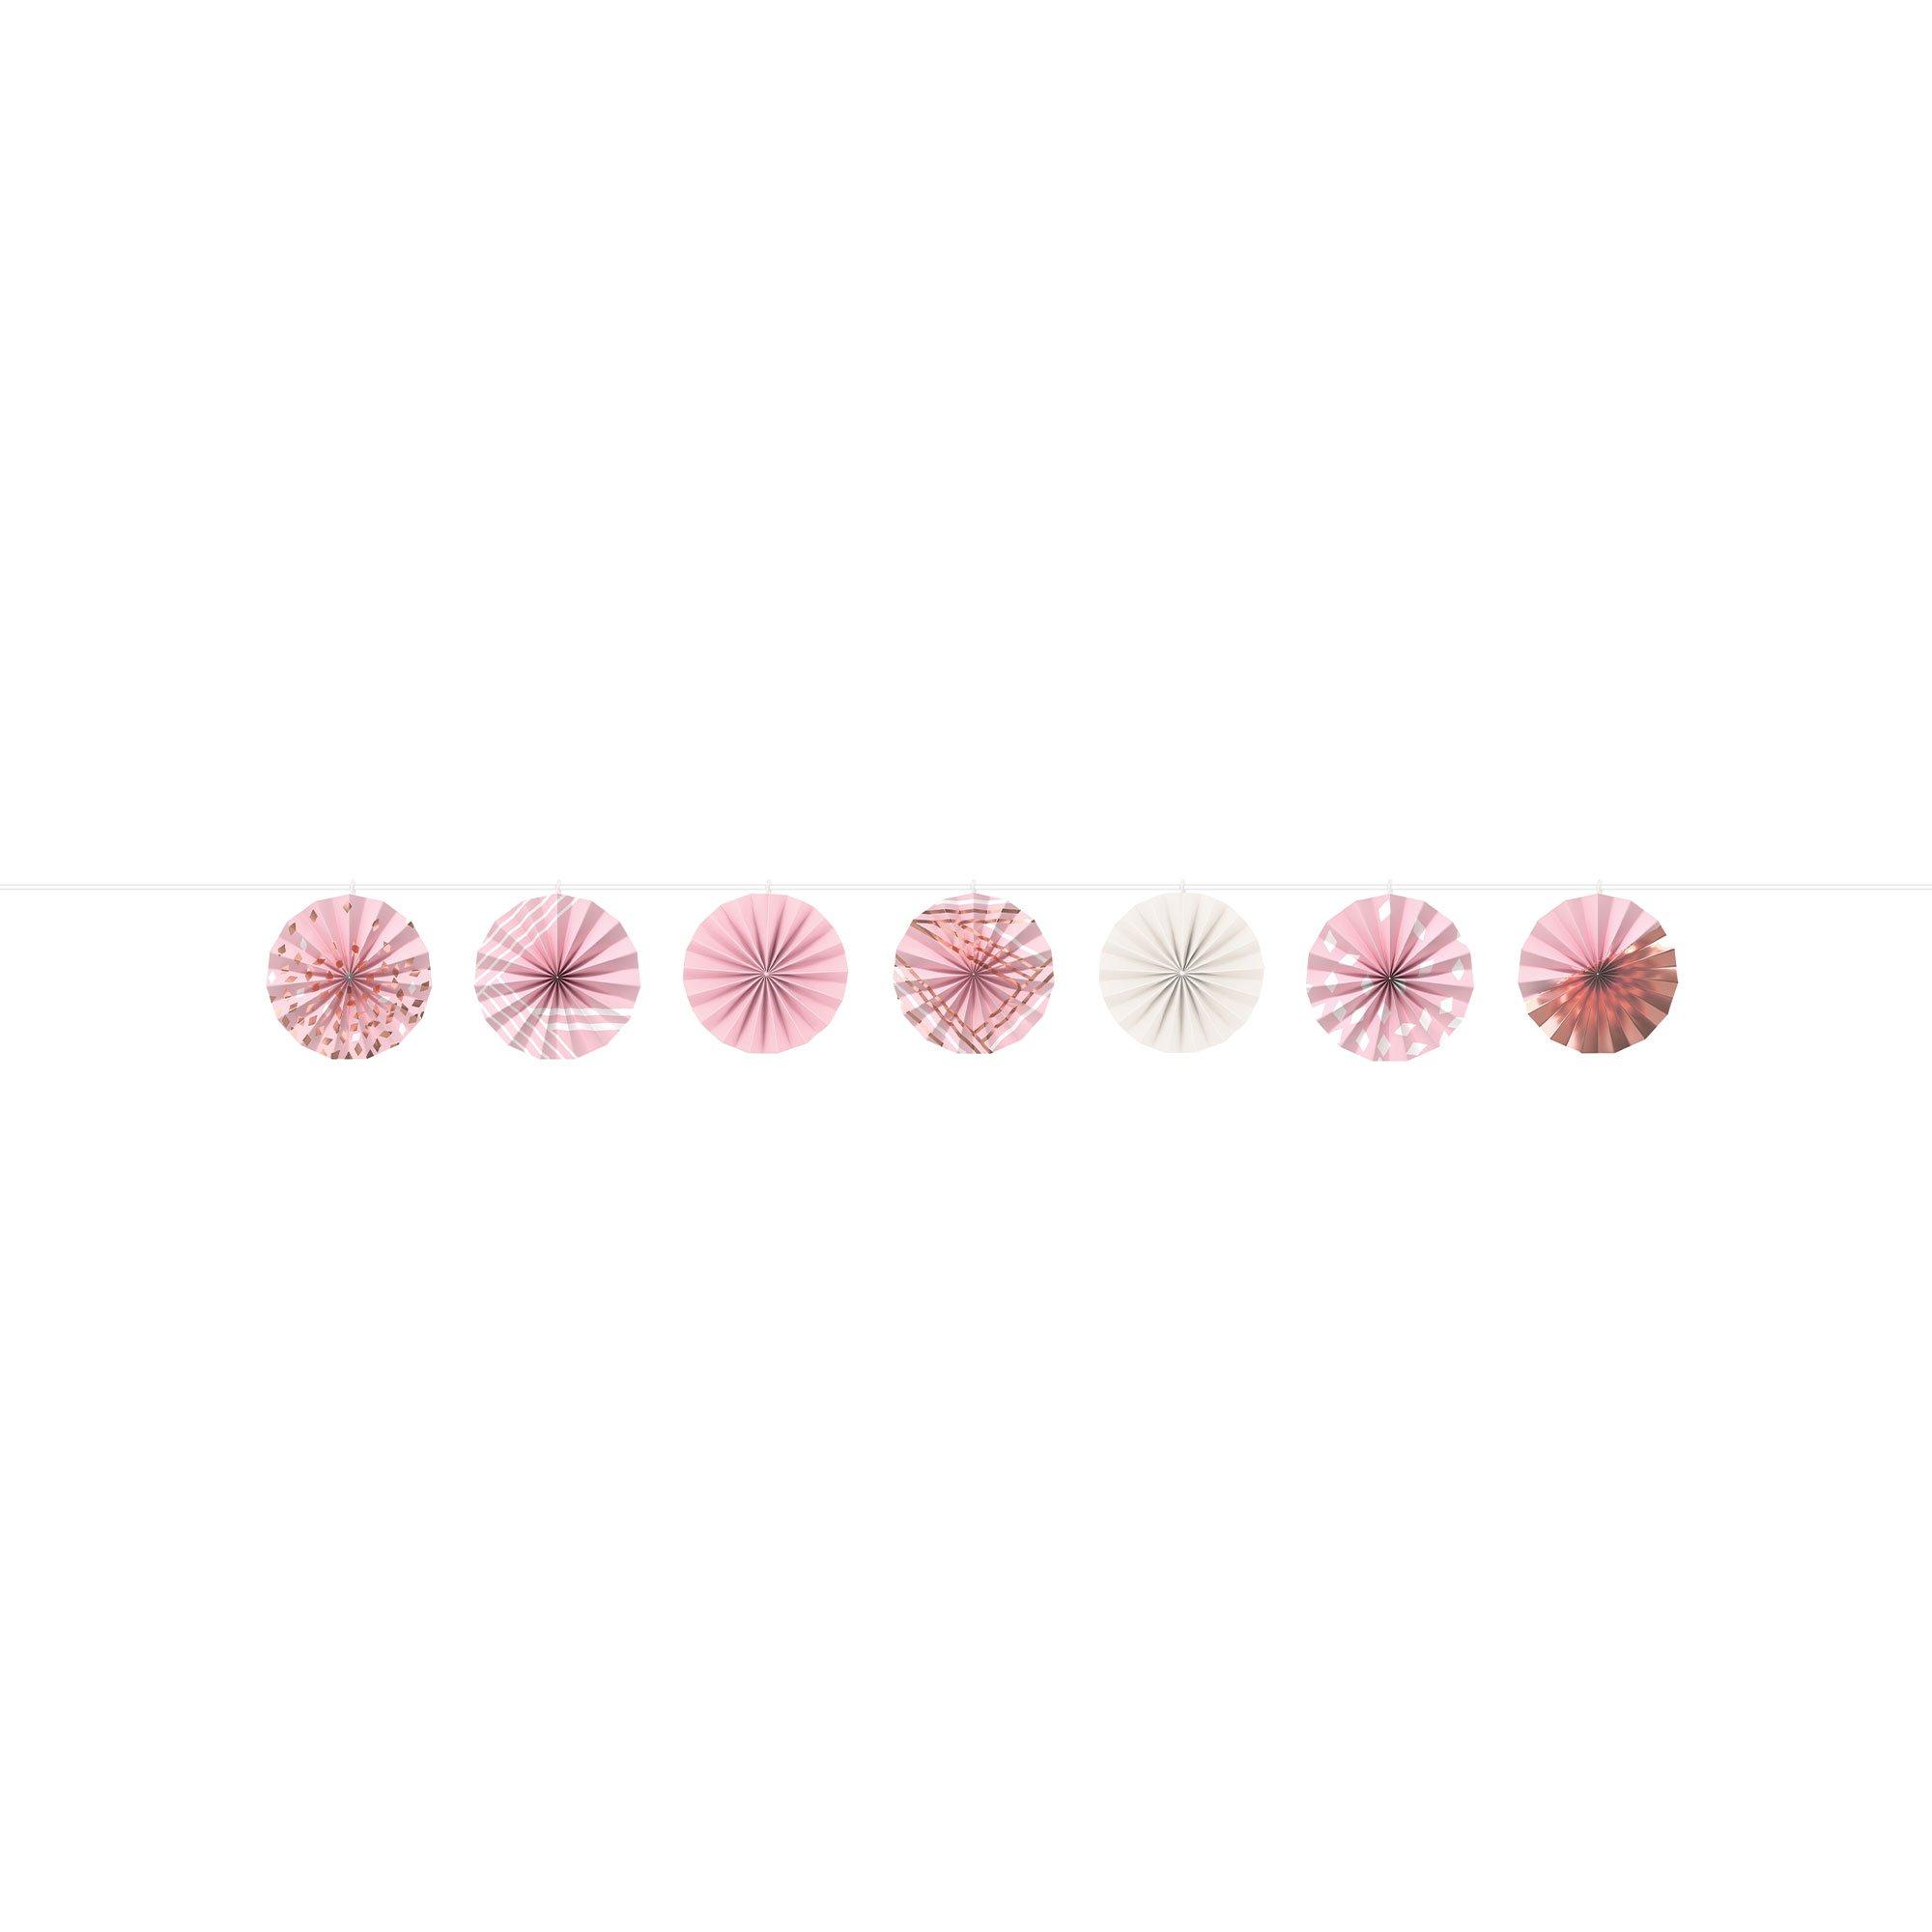 Rose Gold & Blush Mini Paper Fans Ribbon Garland Foil Hot Stamped